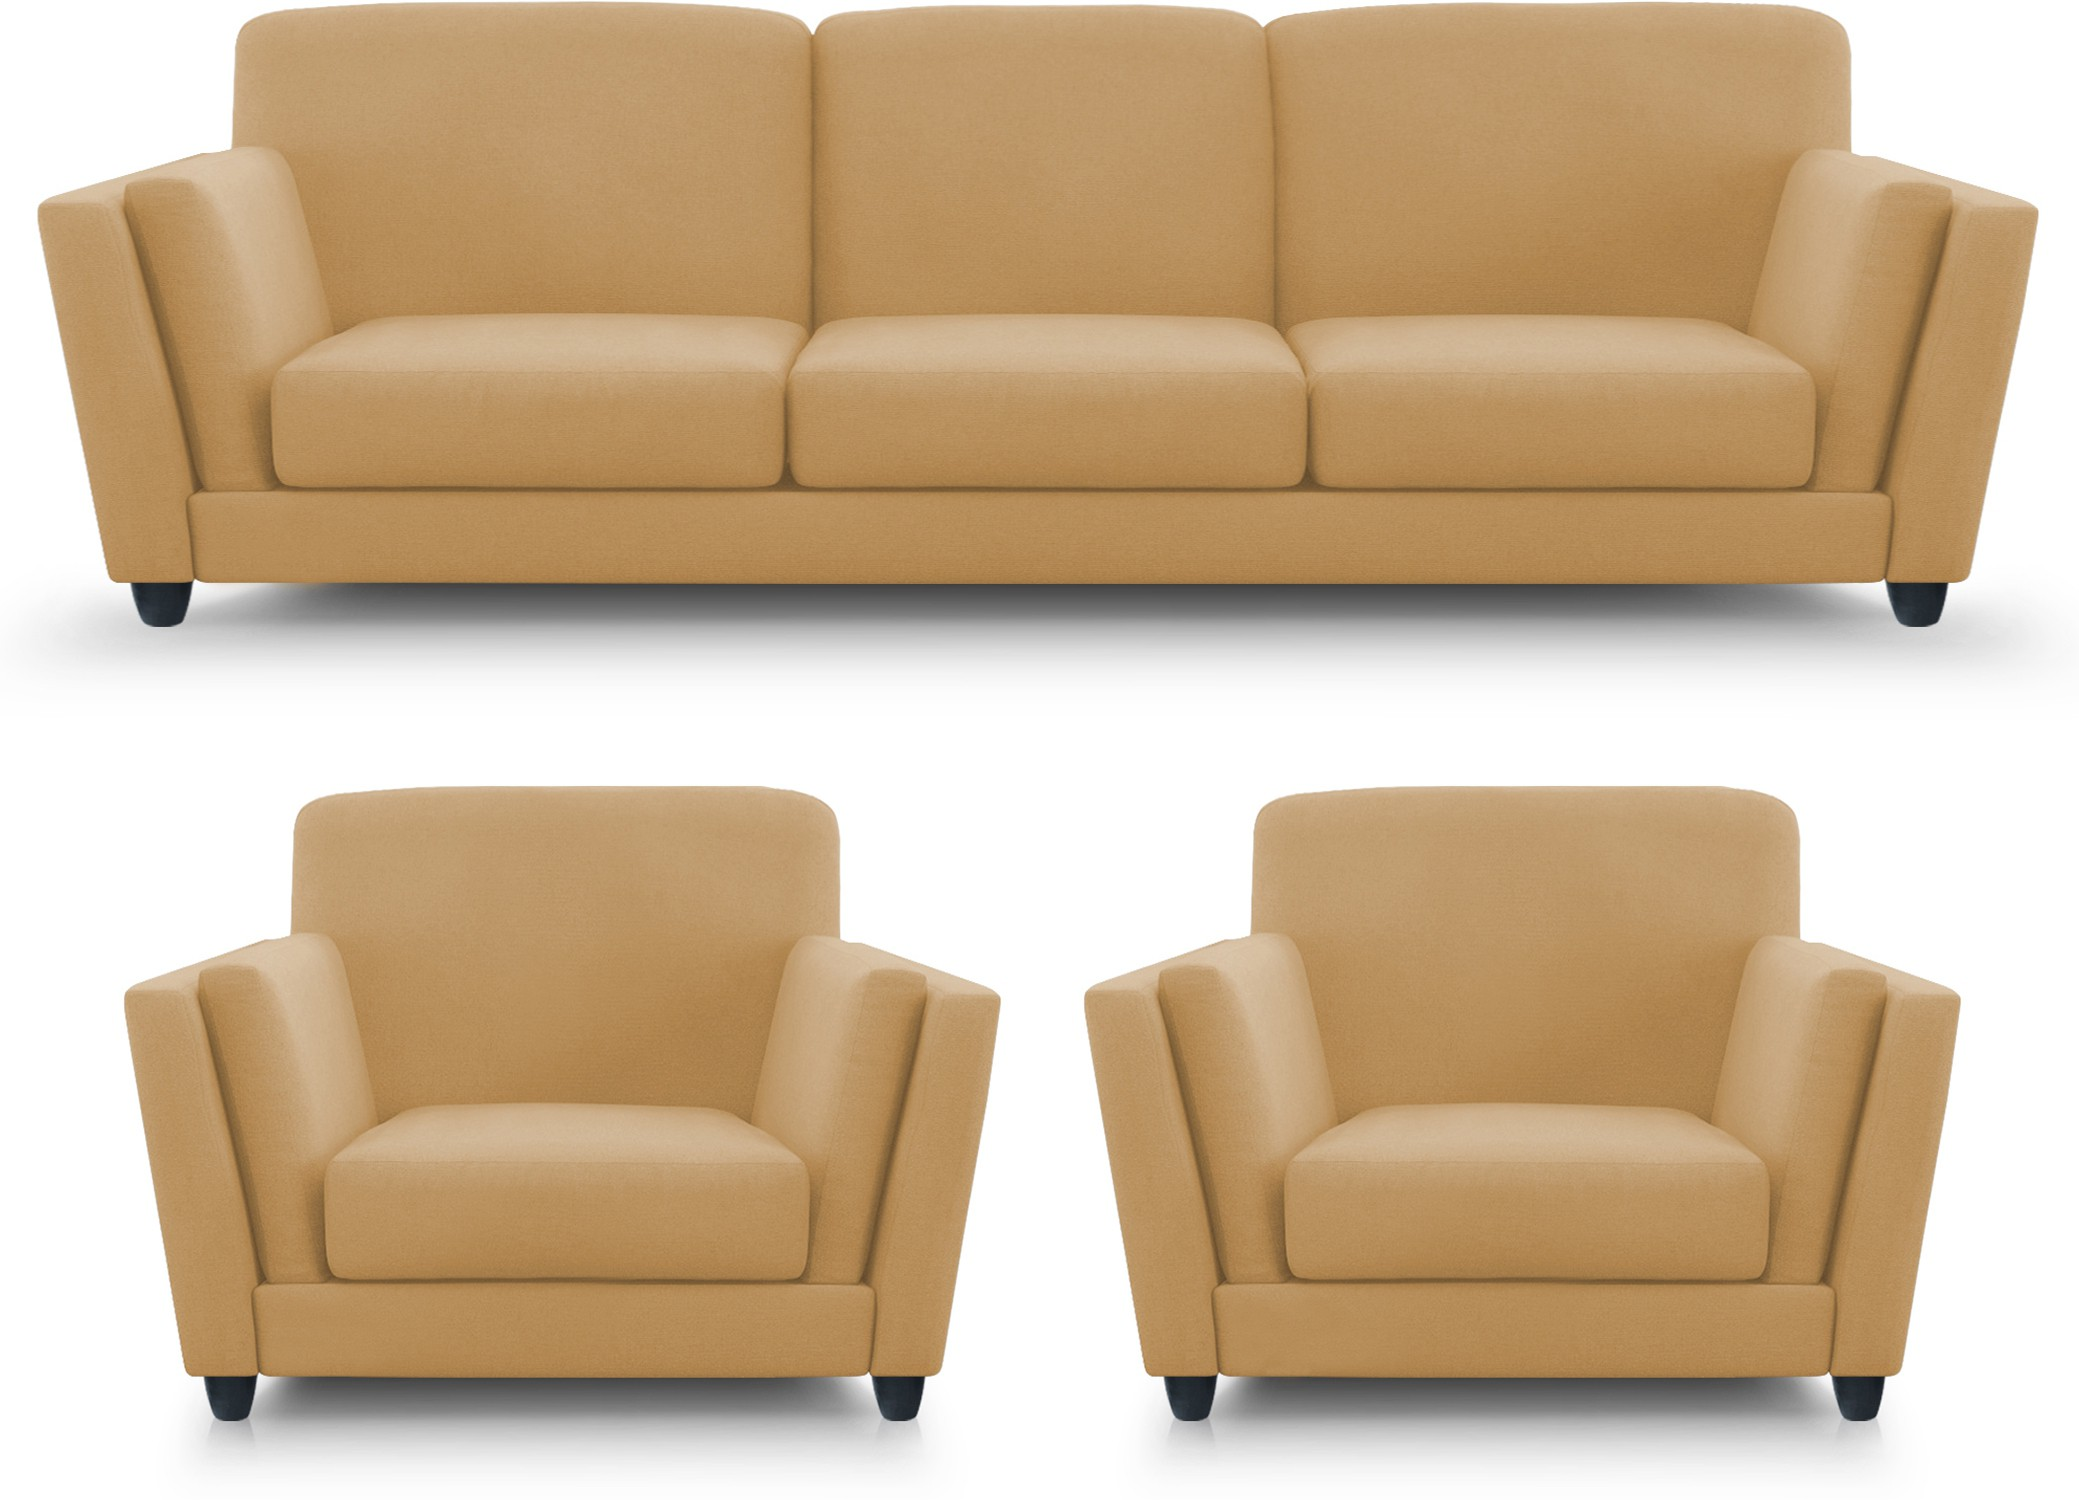 Dolphin Cabana Fabric 3 + 1 + 1 Beige Sofa Set(Configuration - Straight)